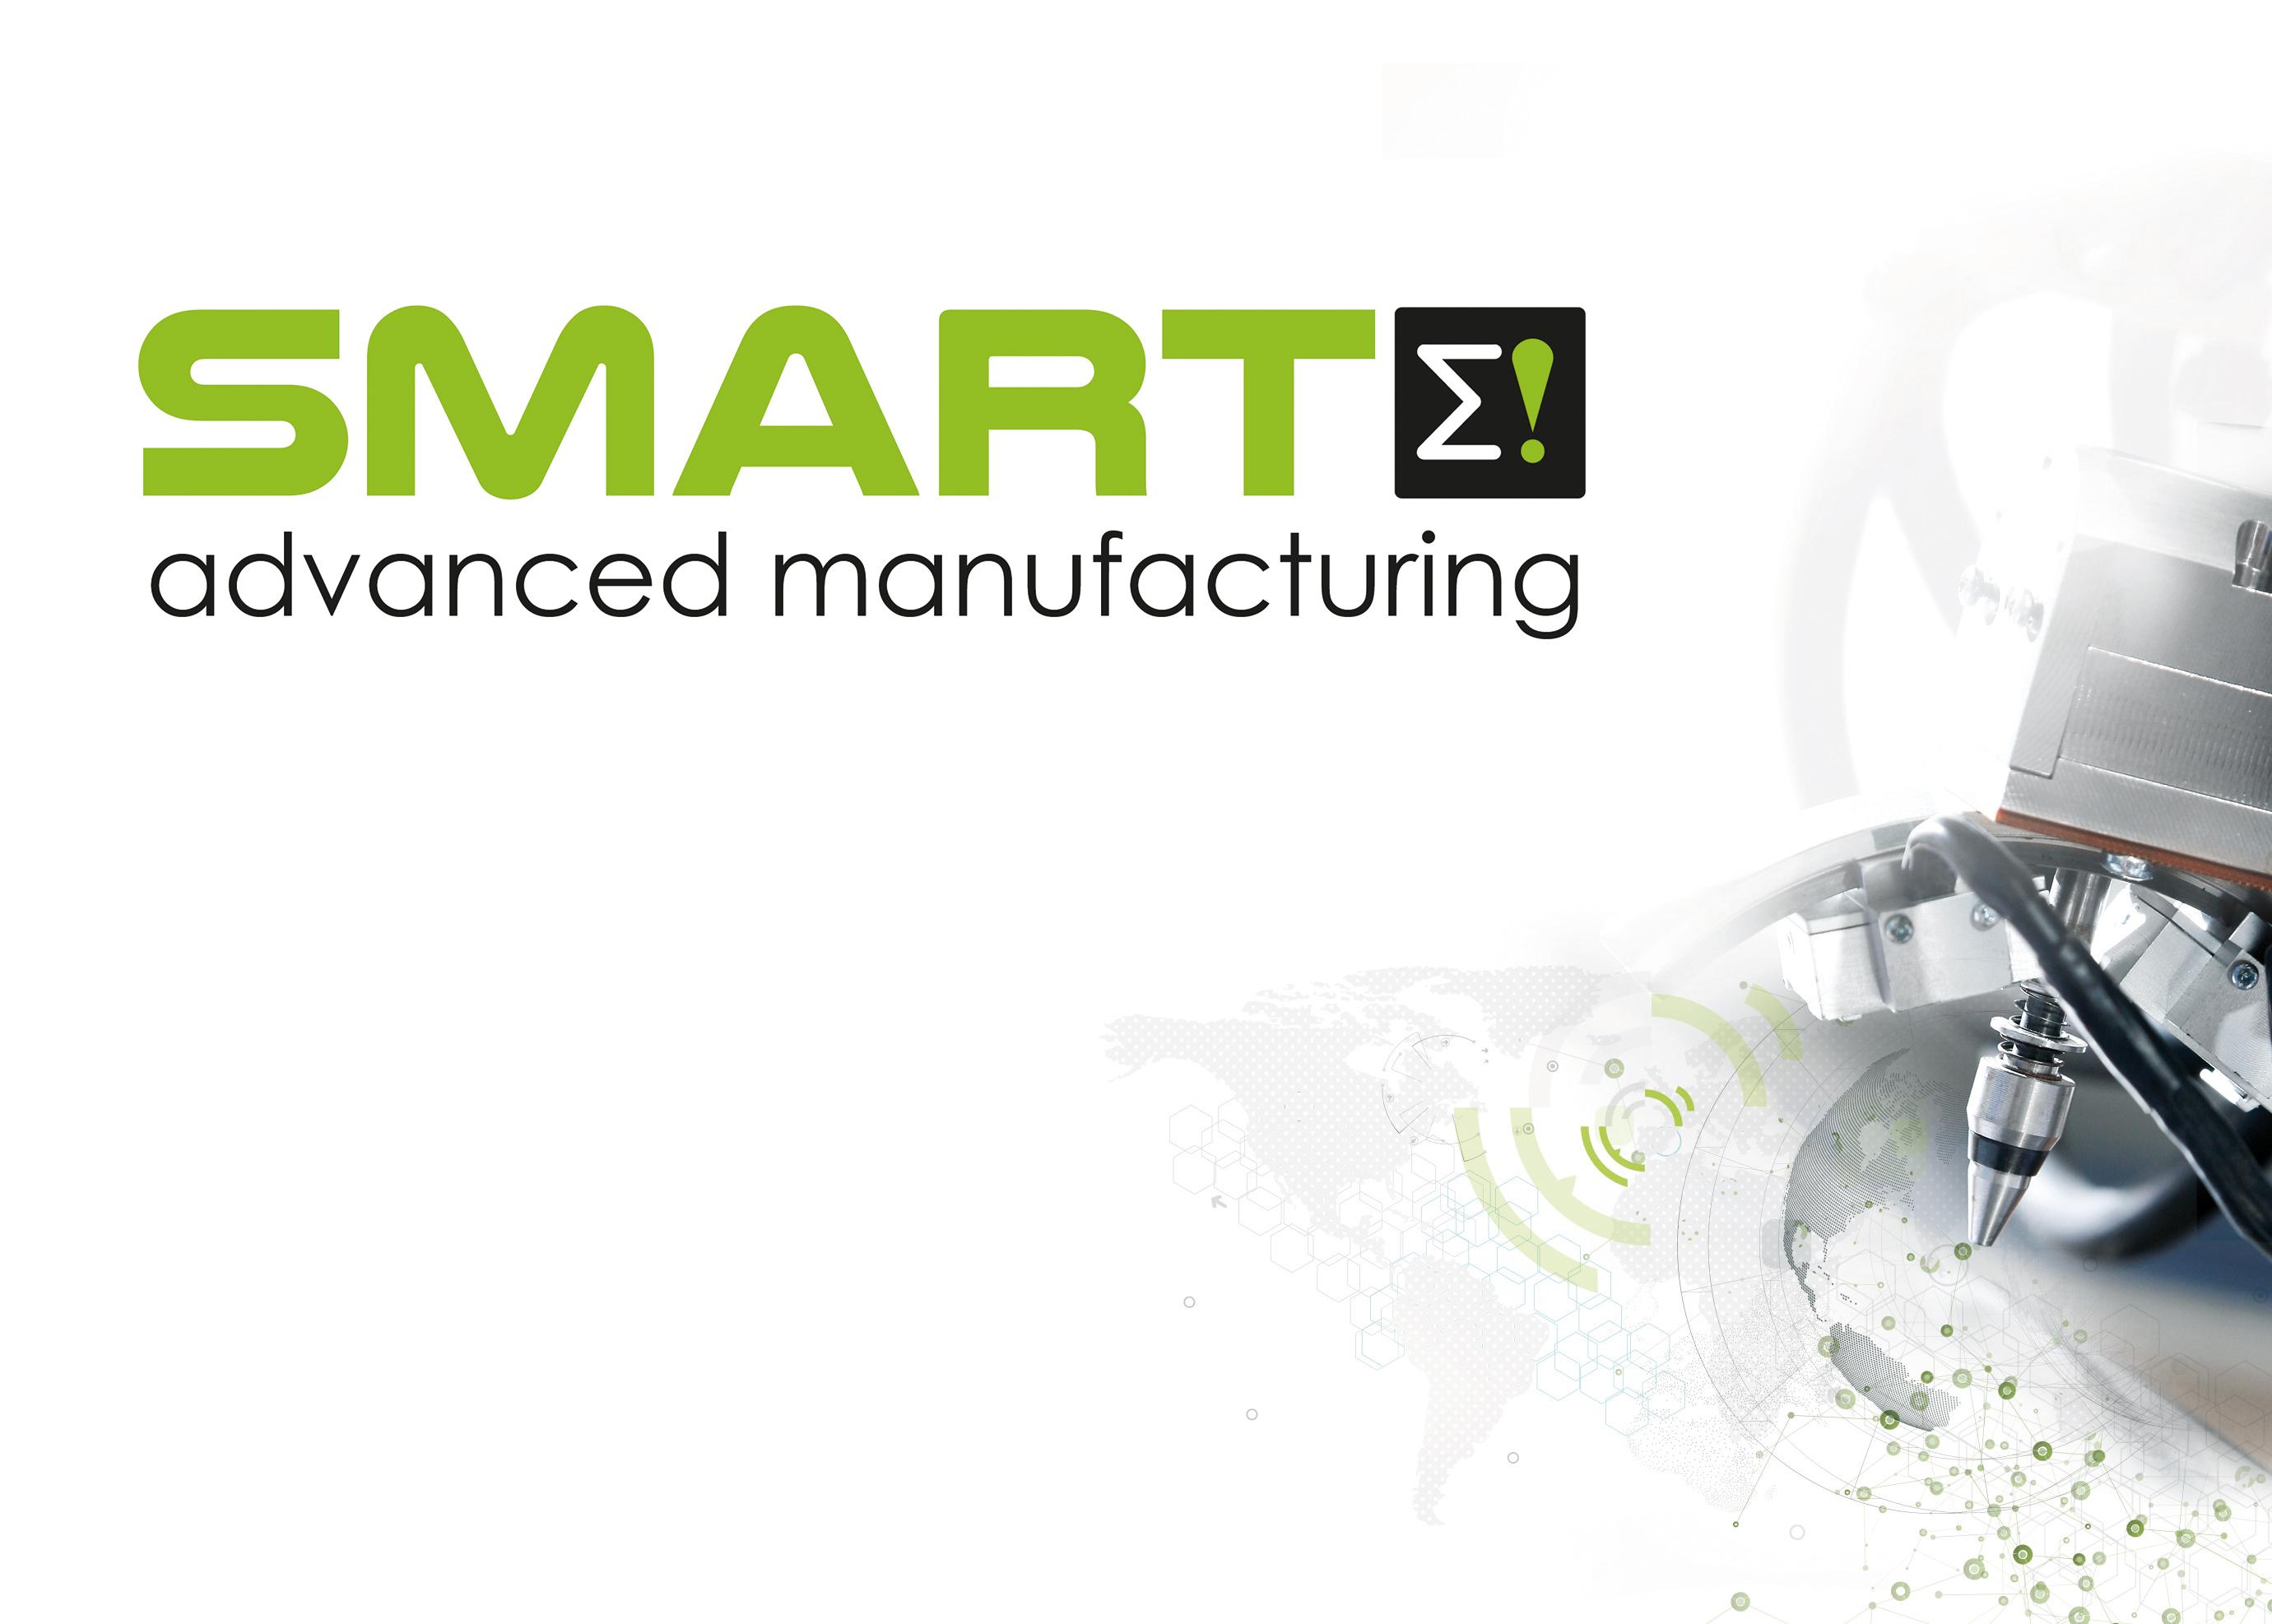 20 proyectos reciben el sello SMART en la Primera Convocatoria de SMART